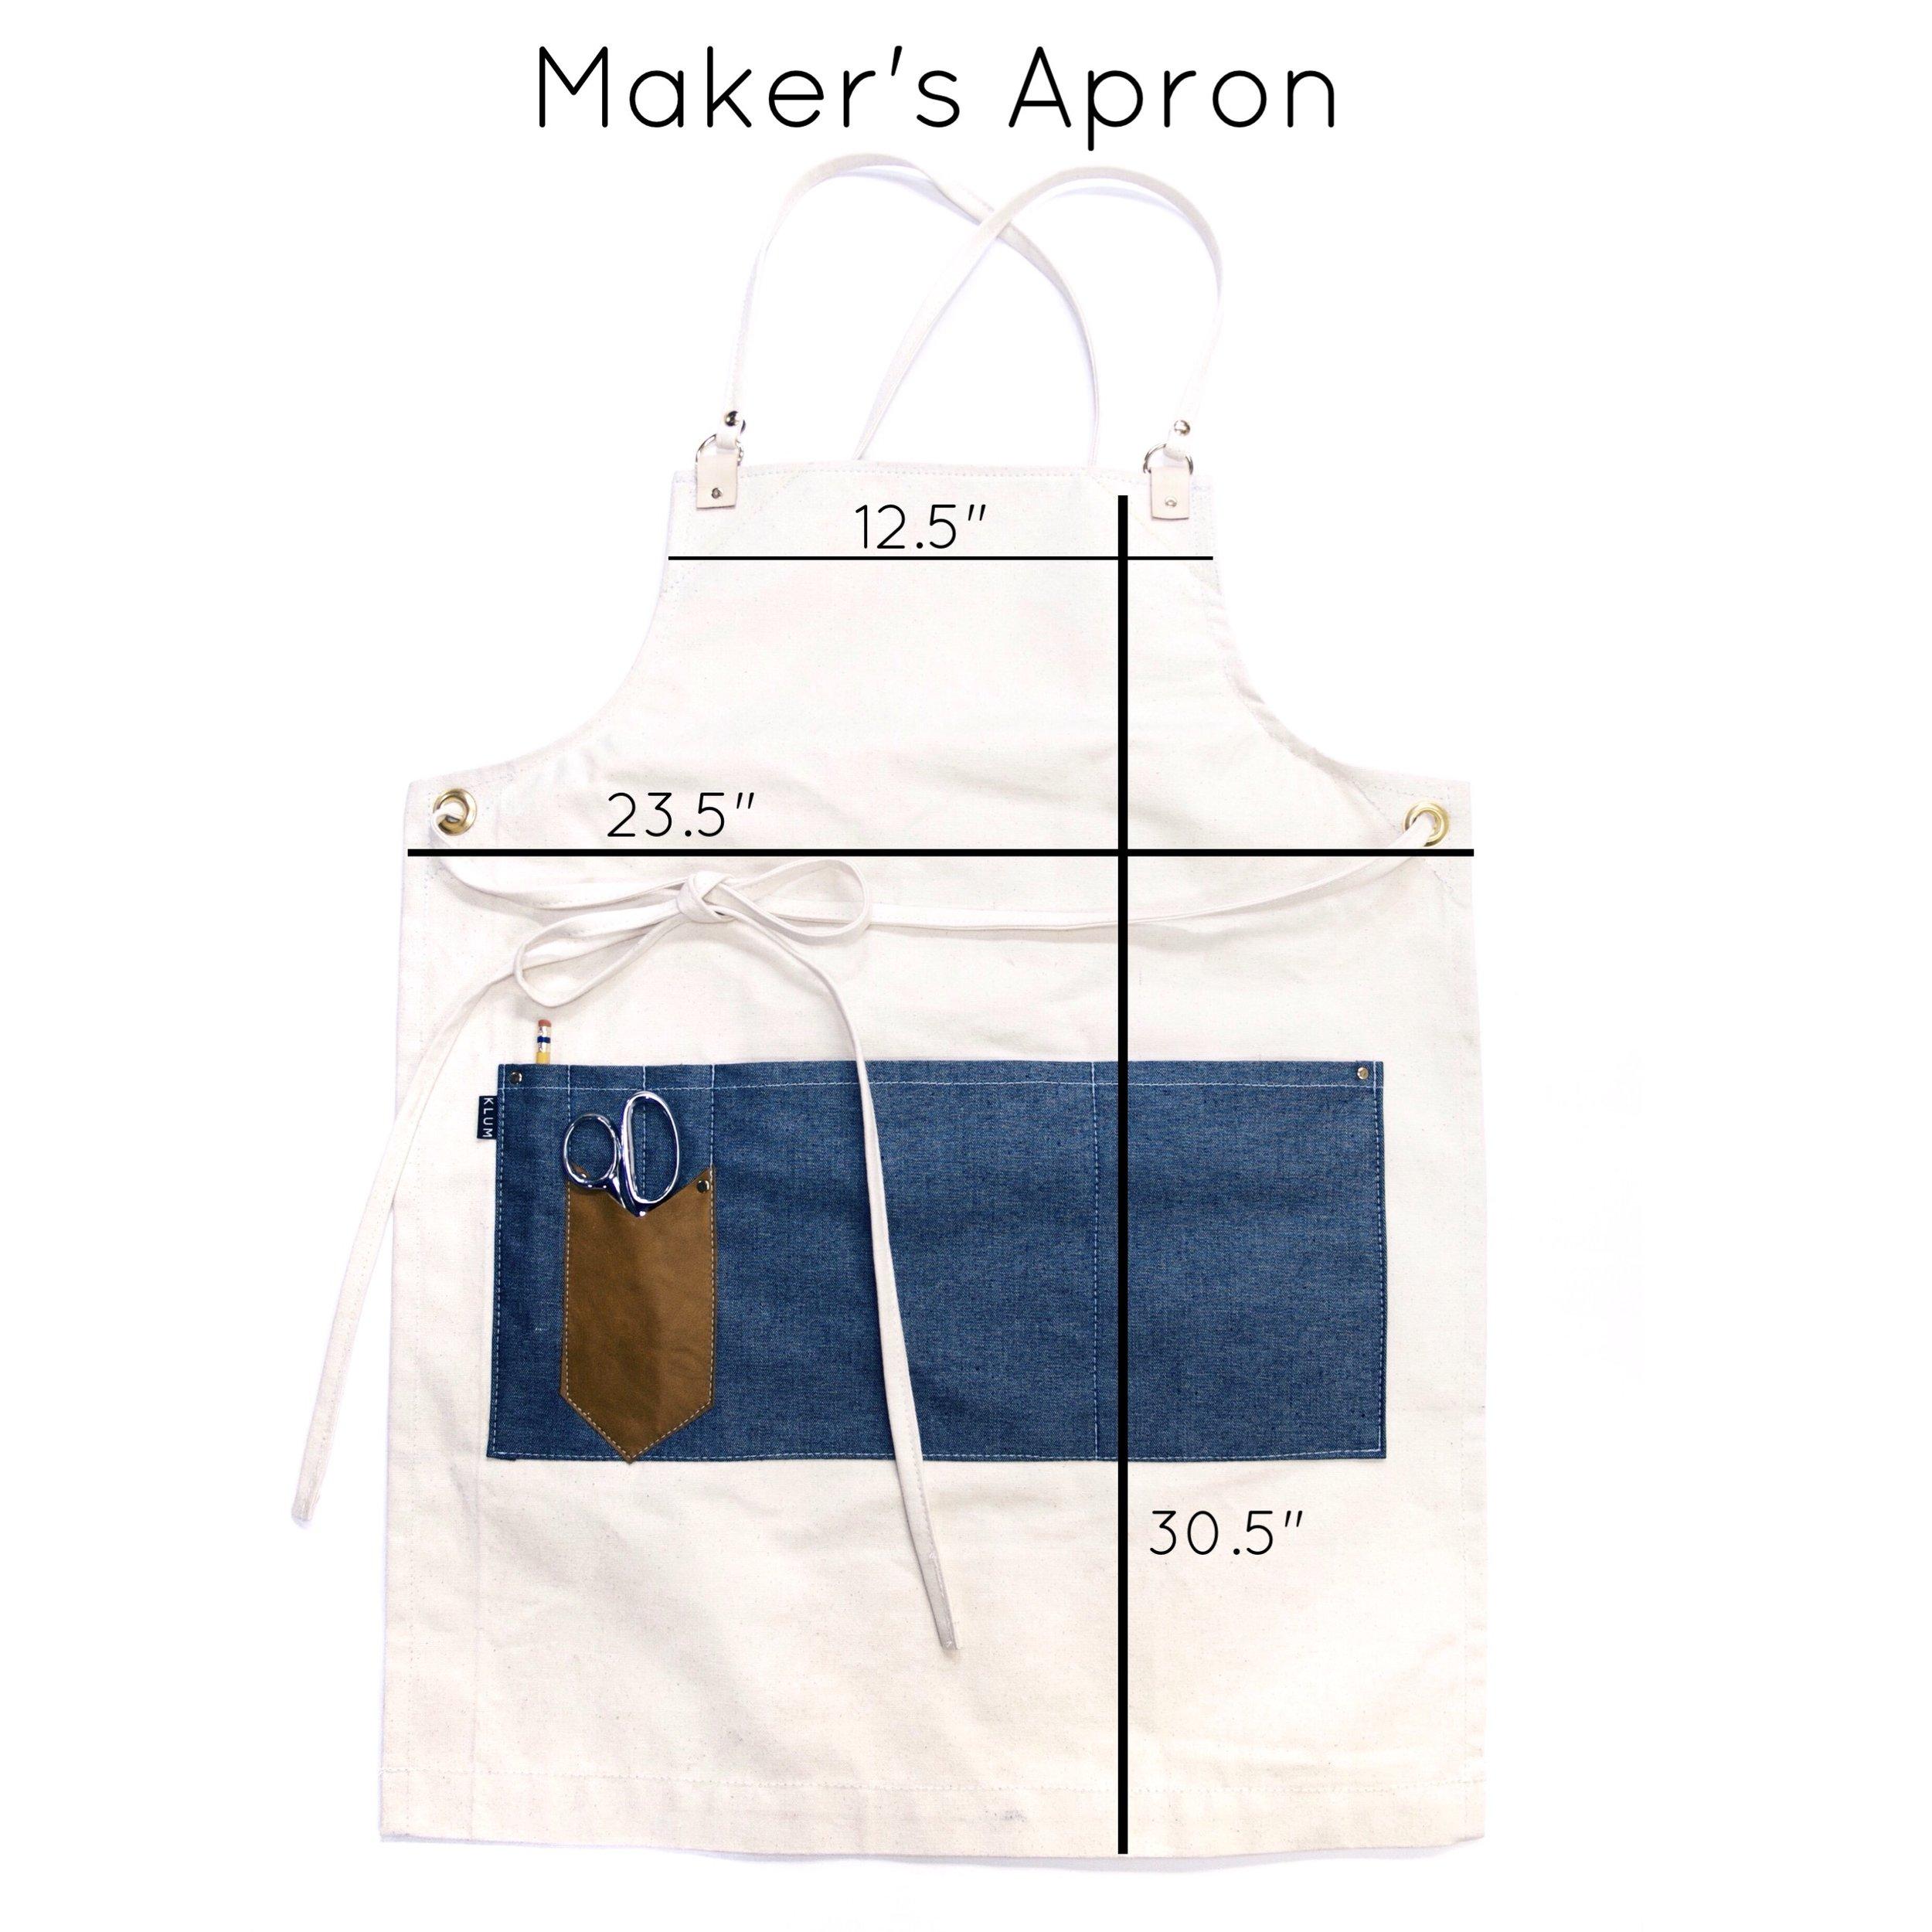 Makers-Apron-Dimensions.JPG